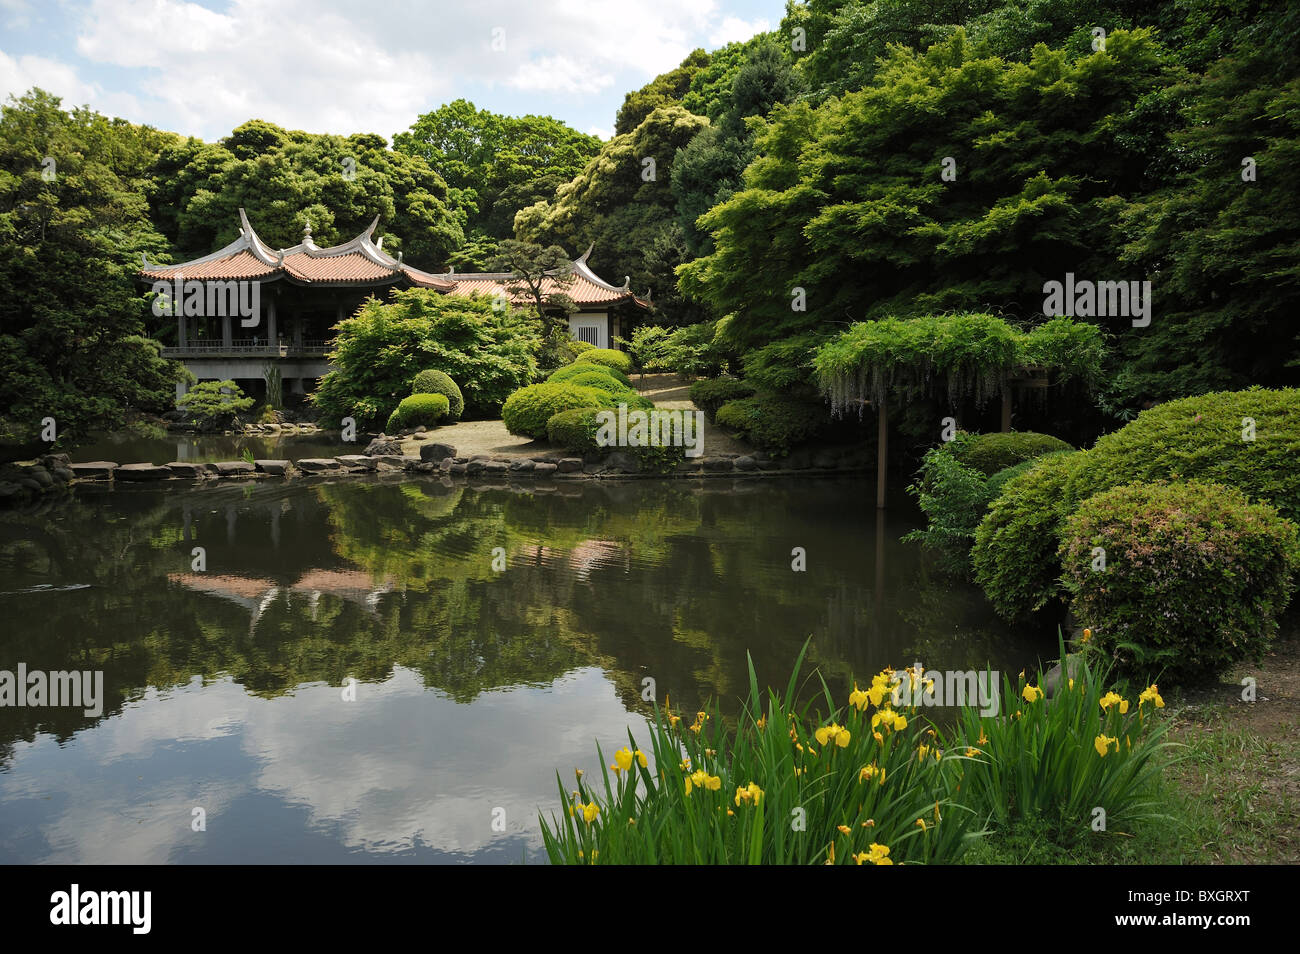 traditionelle japanische teehaus im park shinjuku tokyo japan stockfoto bild 33561440 alamy. Black Bedroom Furniture Sets. Home Design Ideas